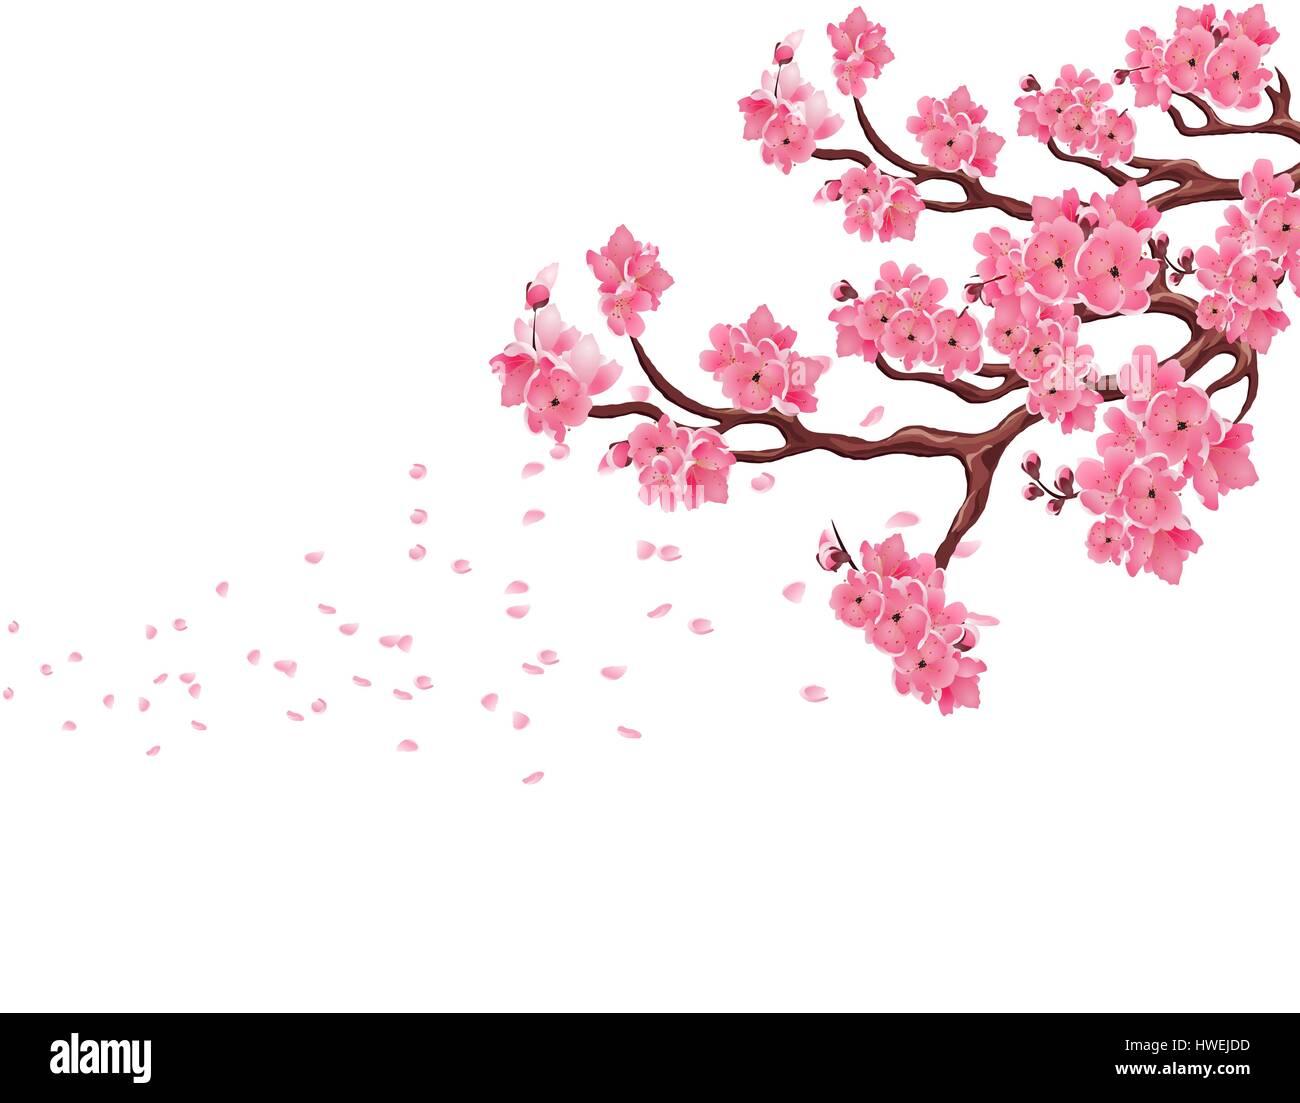 Sakura Falling Live Wallpaper Branches With Pink Cherry Blossoms Sakura The Petals Fly